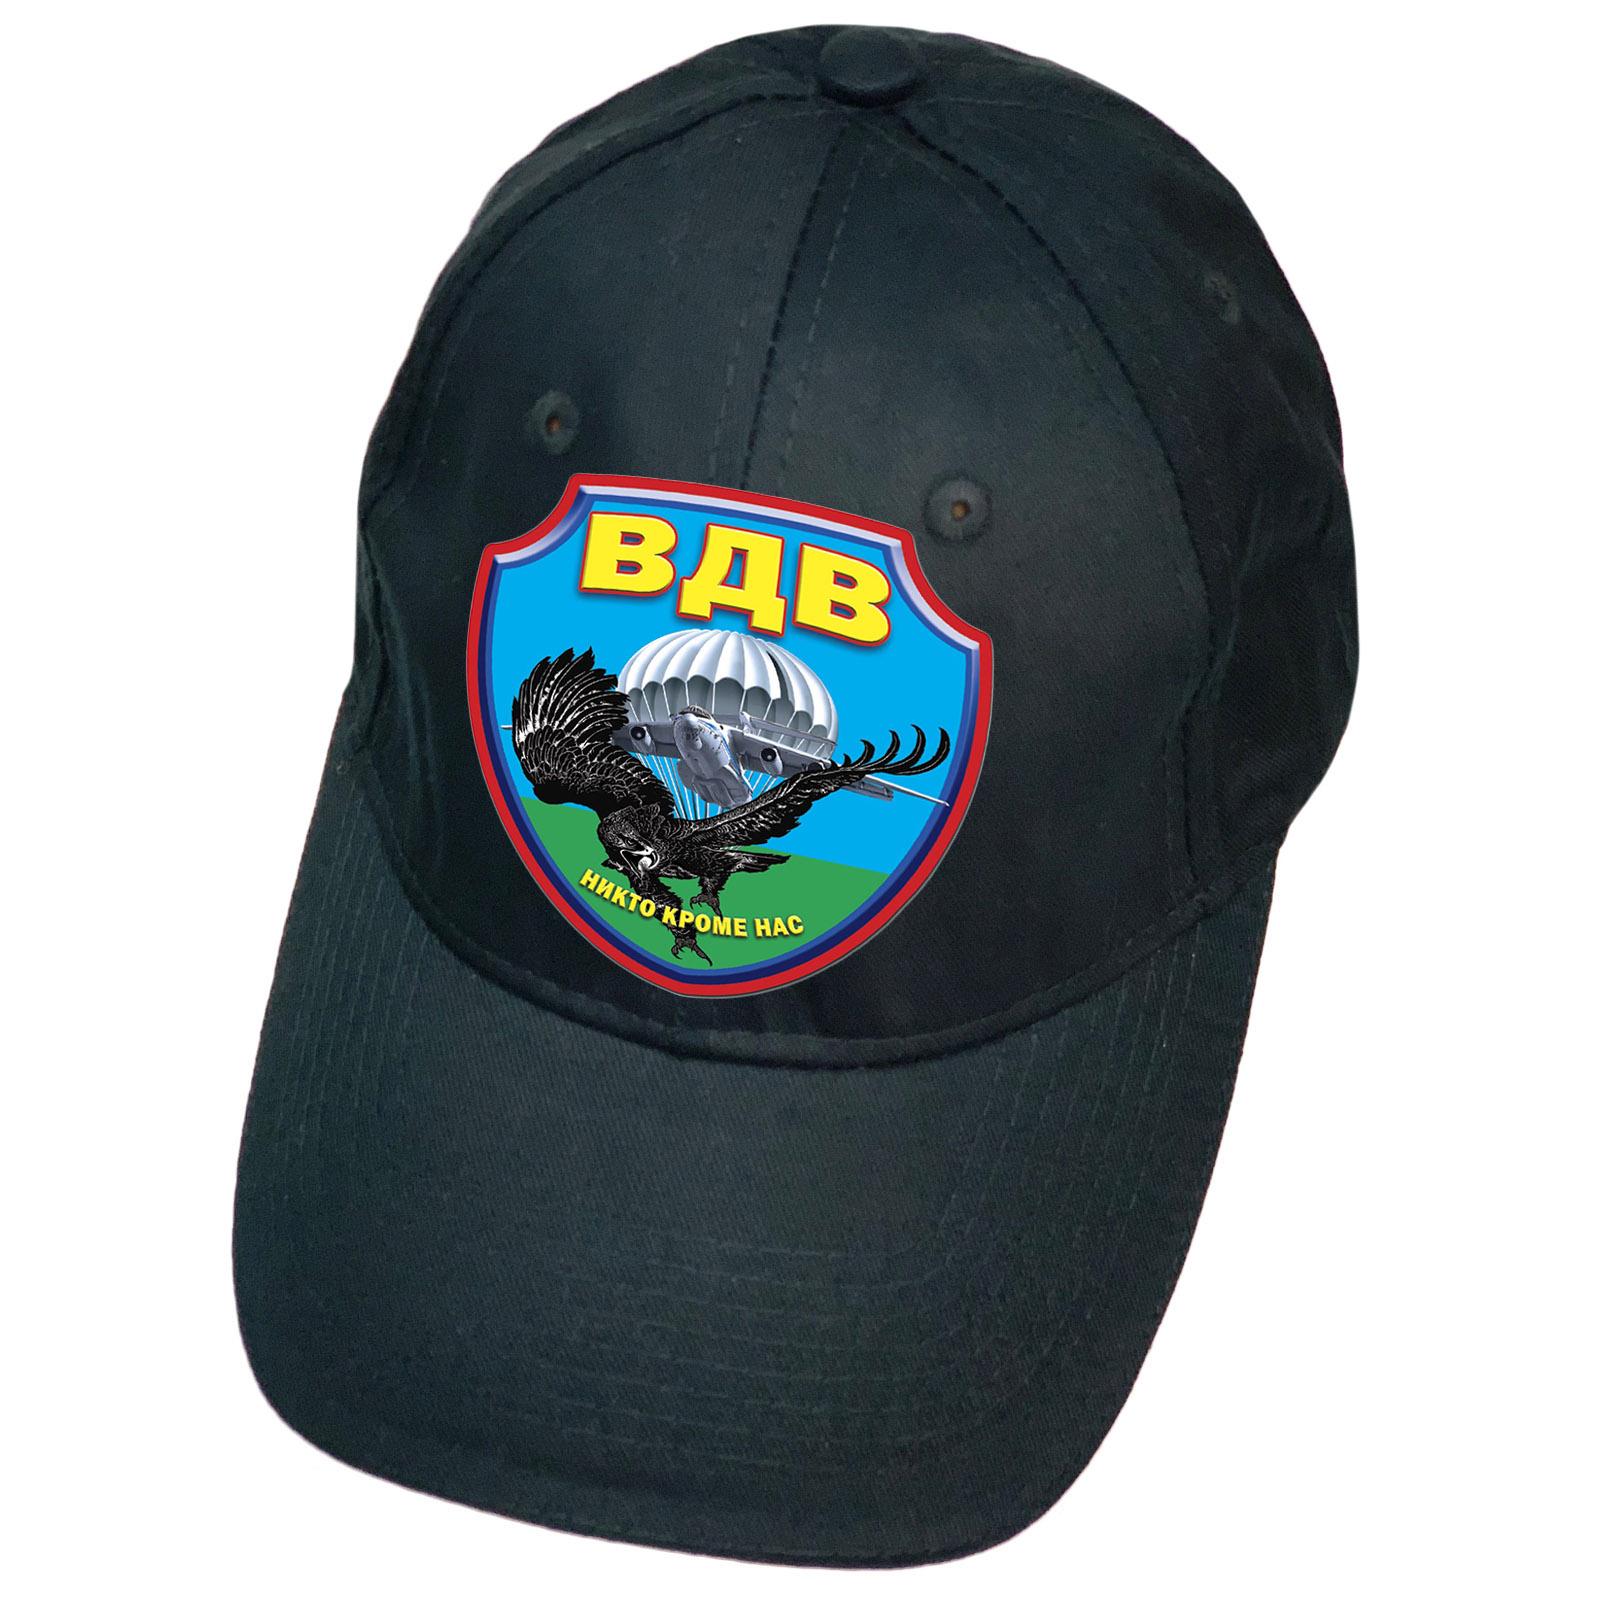 Тёмно-синяя кепка с термотрансфером ВДВ